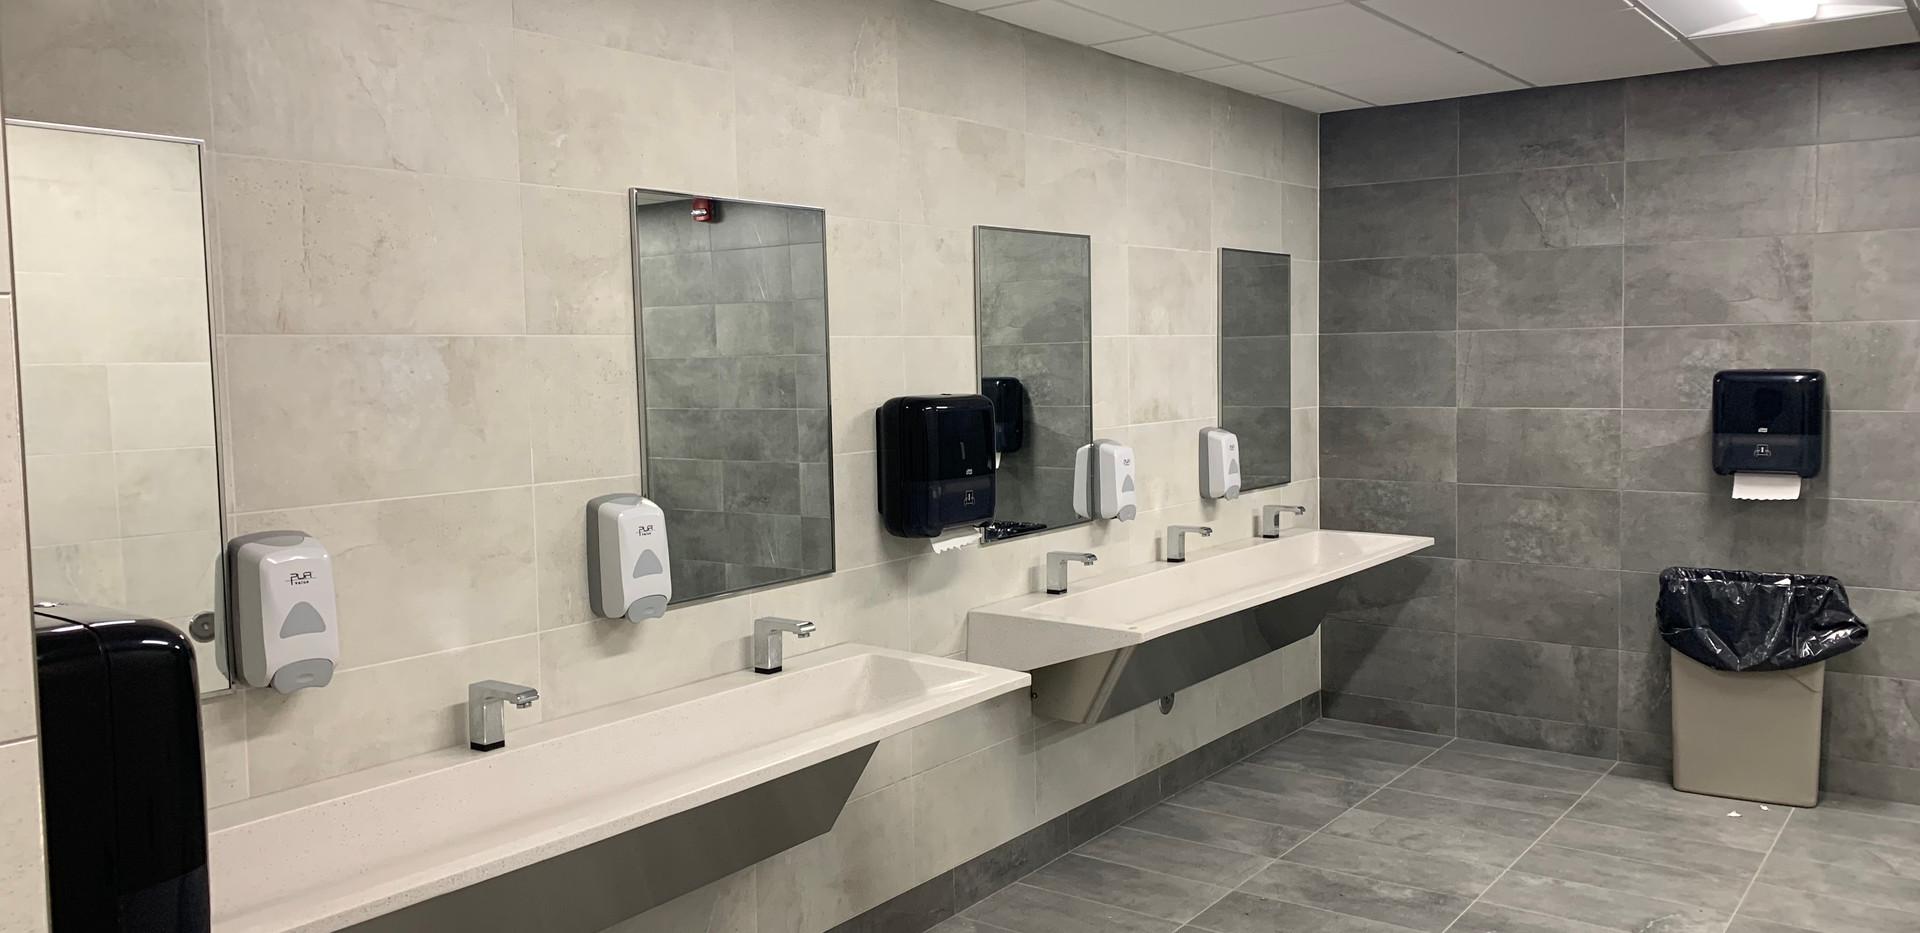 Main Washrooms